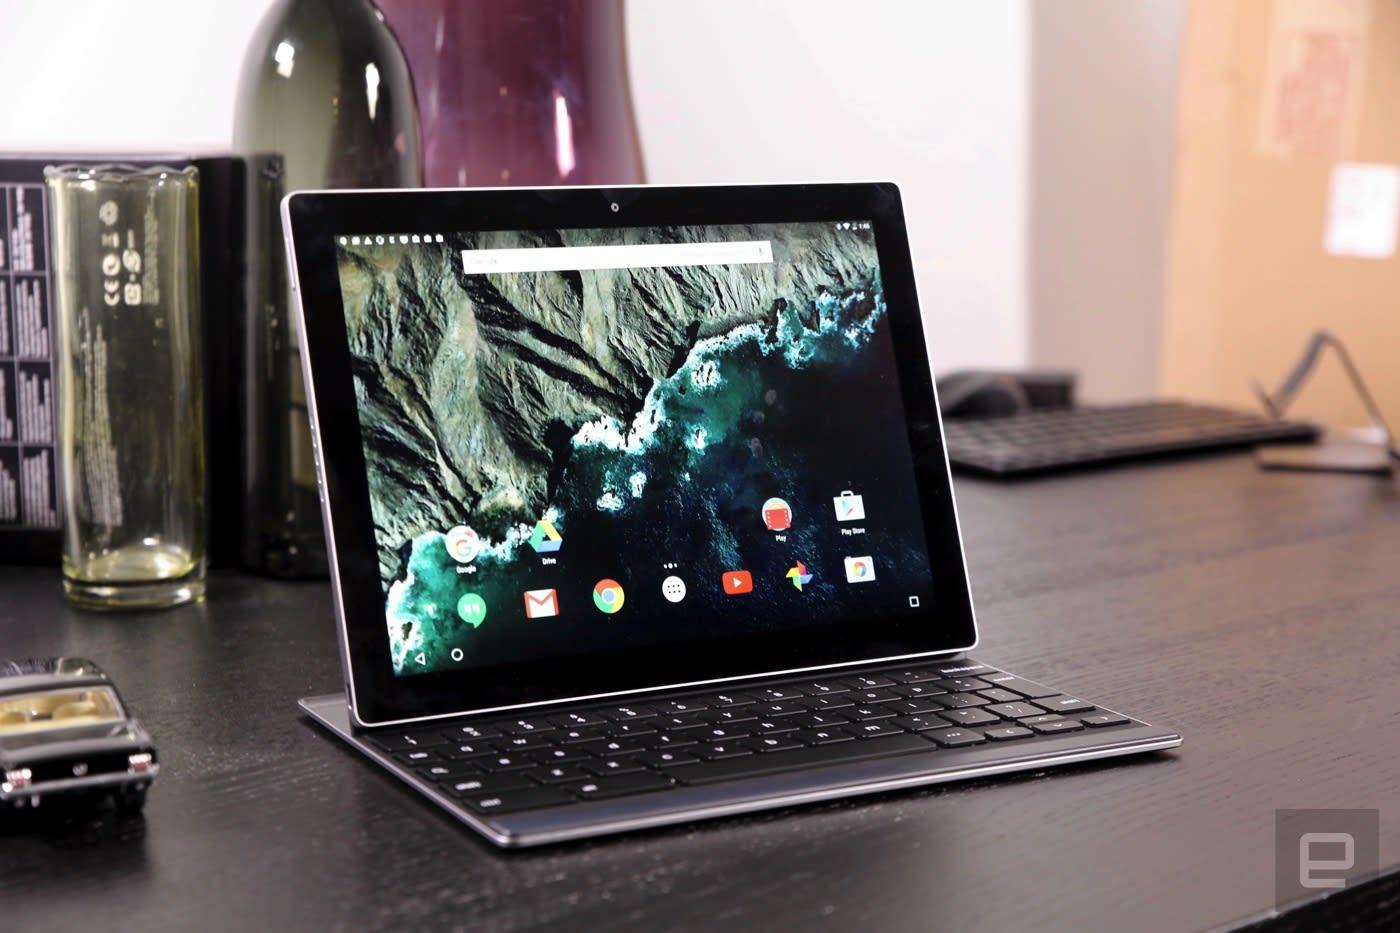 Google is testing Android split-screen multitasking